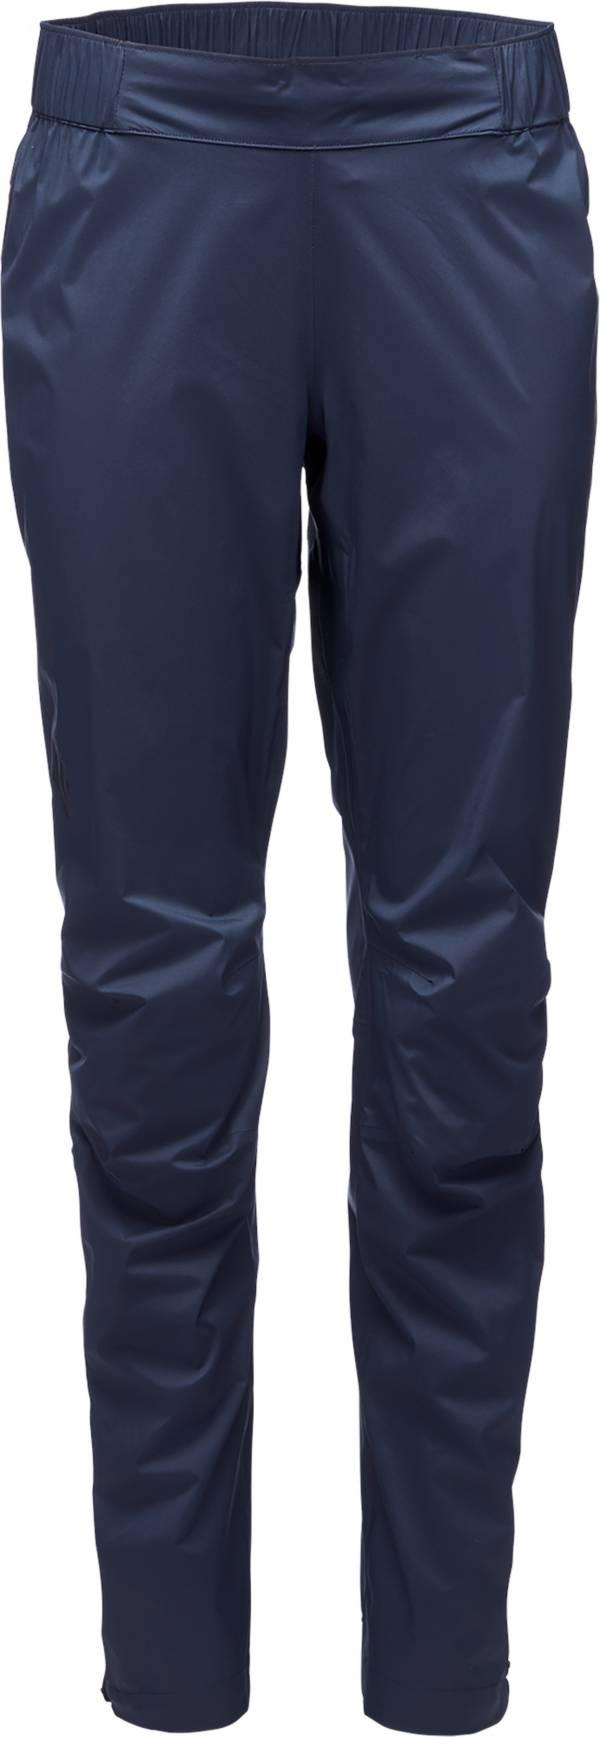 Black Diamond Women's Stormline Stretch Rain Pants product image